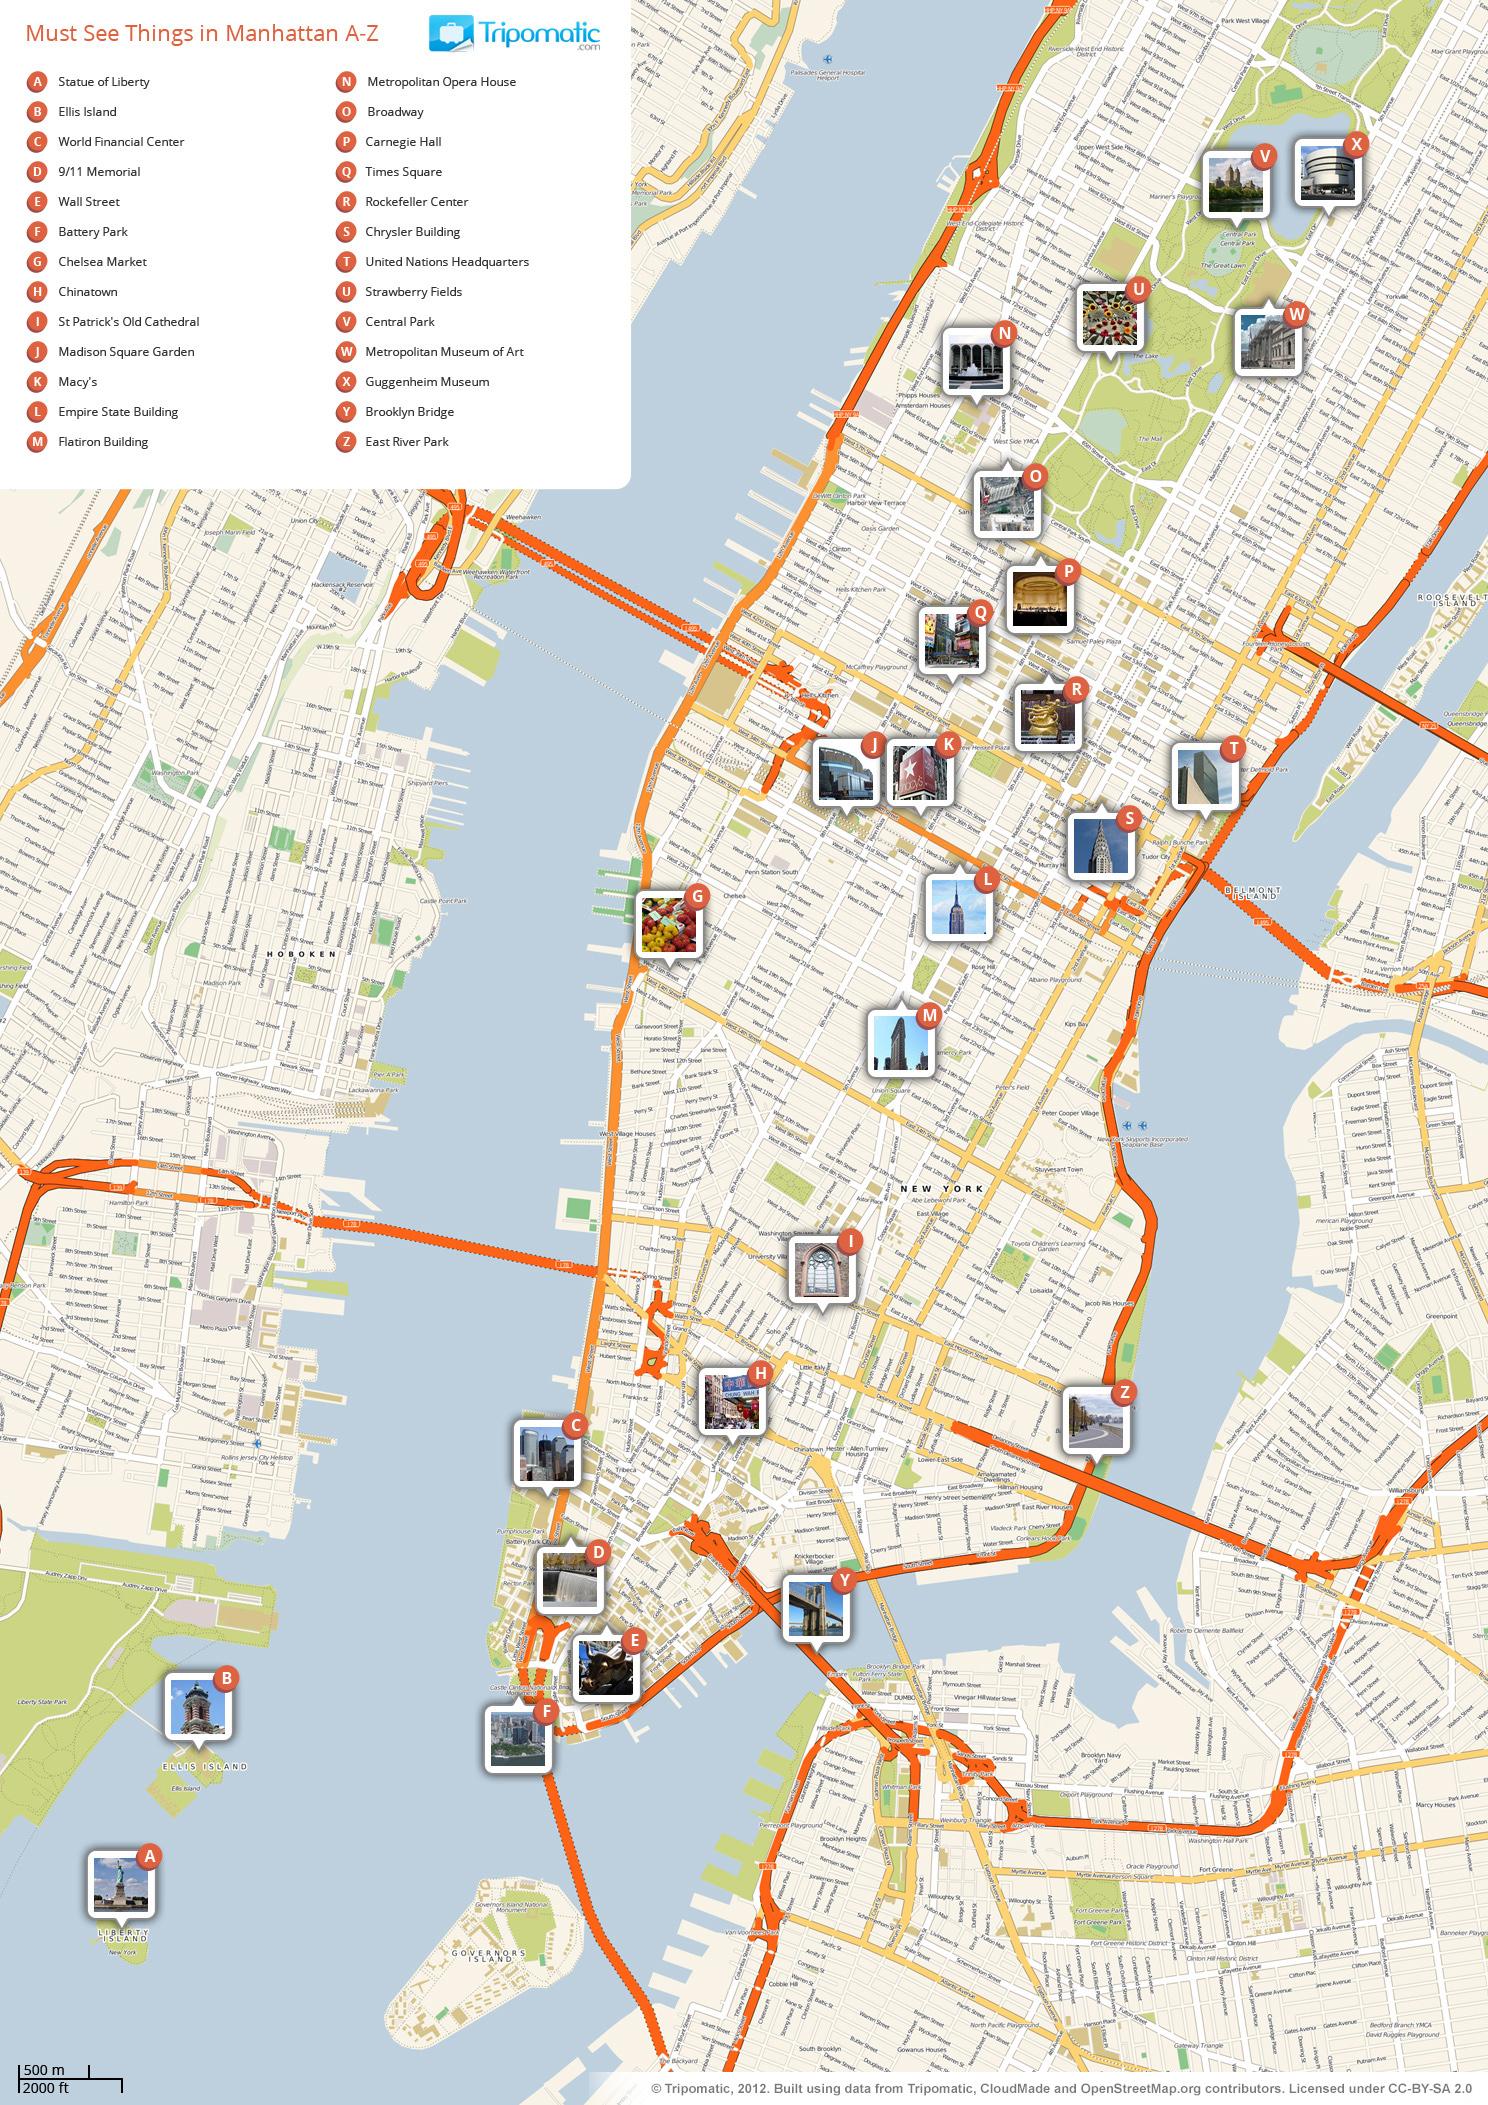 File:new York Manhattan Printable Tourist Attractions Map - Free Printable Map Of Manhattan